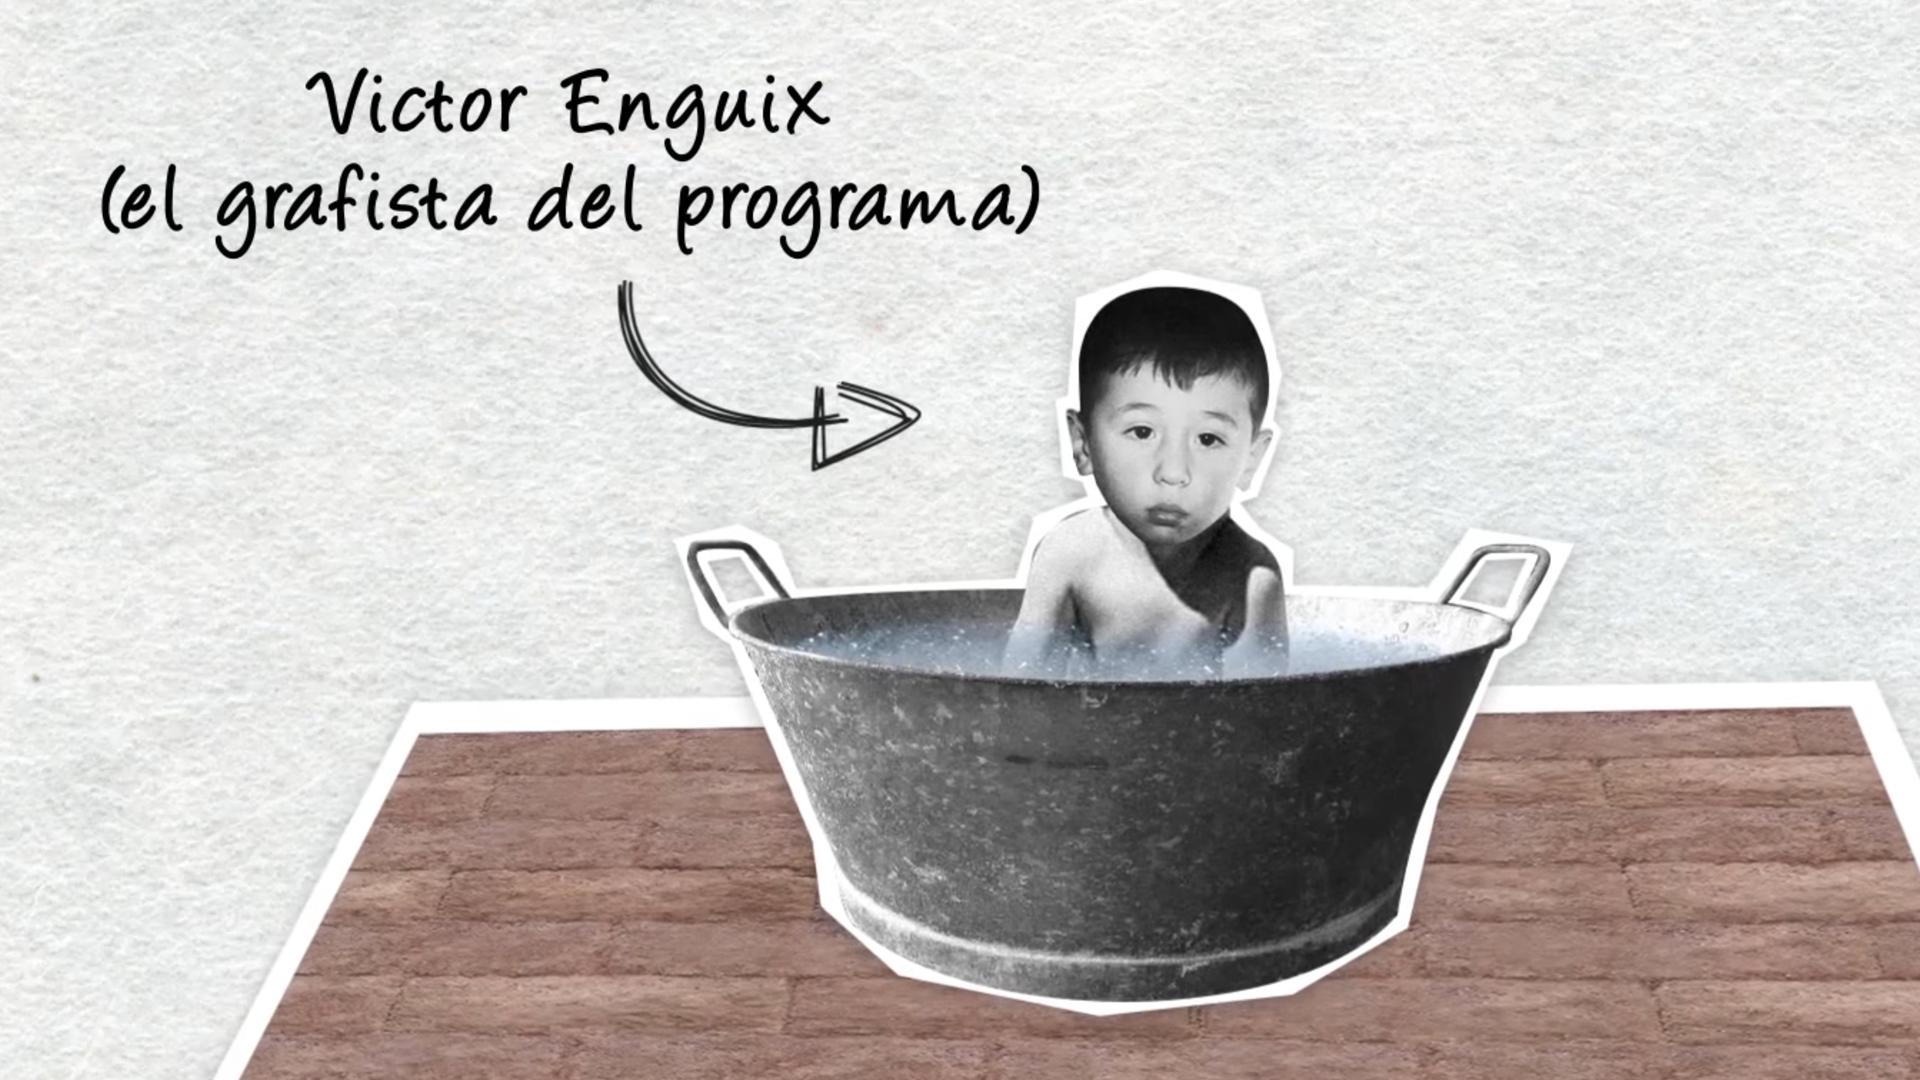 punto_victor_enguix_grafista.jpg